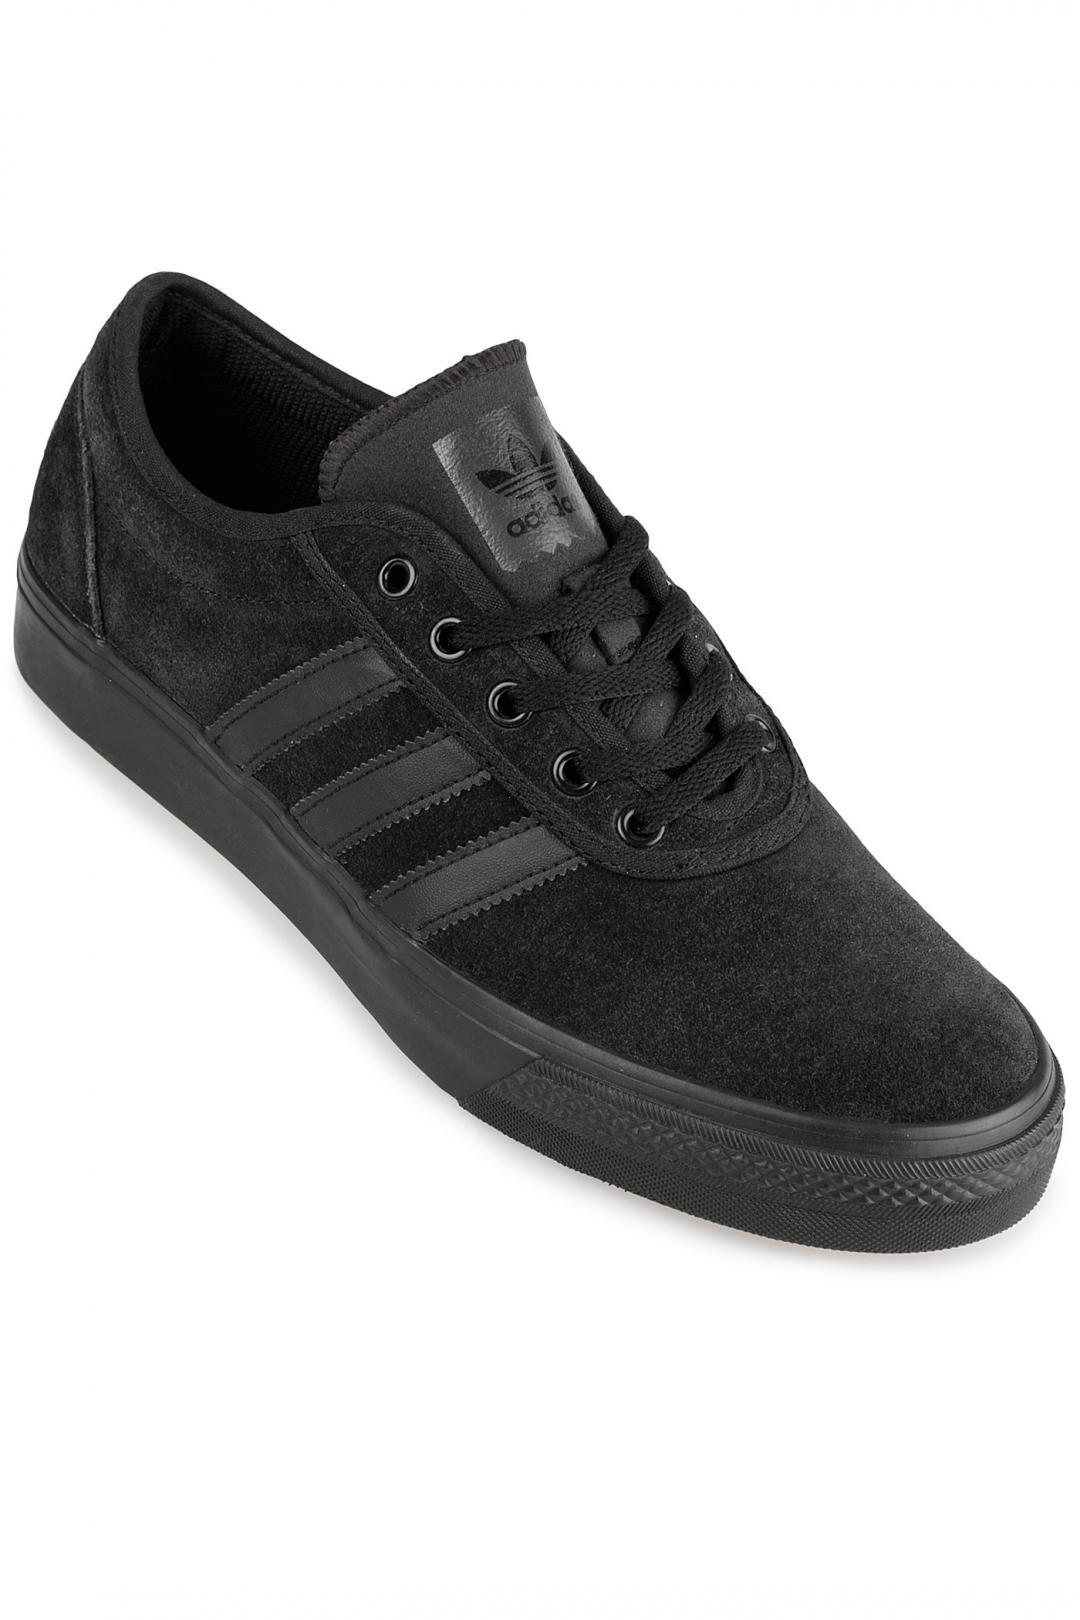 Uomo adidas Skateboarding Adi Ease core black core black core black   Scarpe da skate